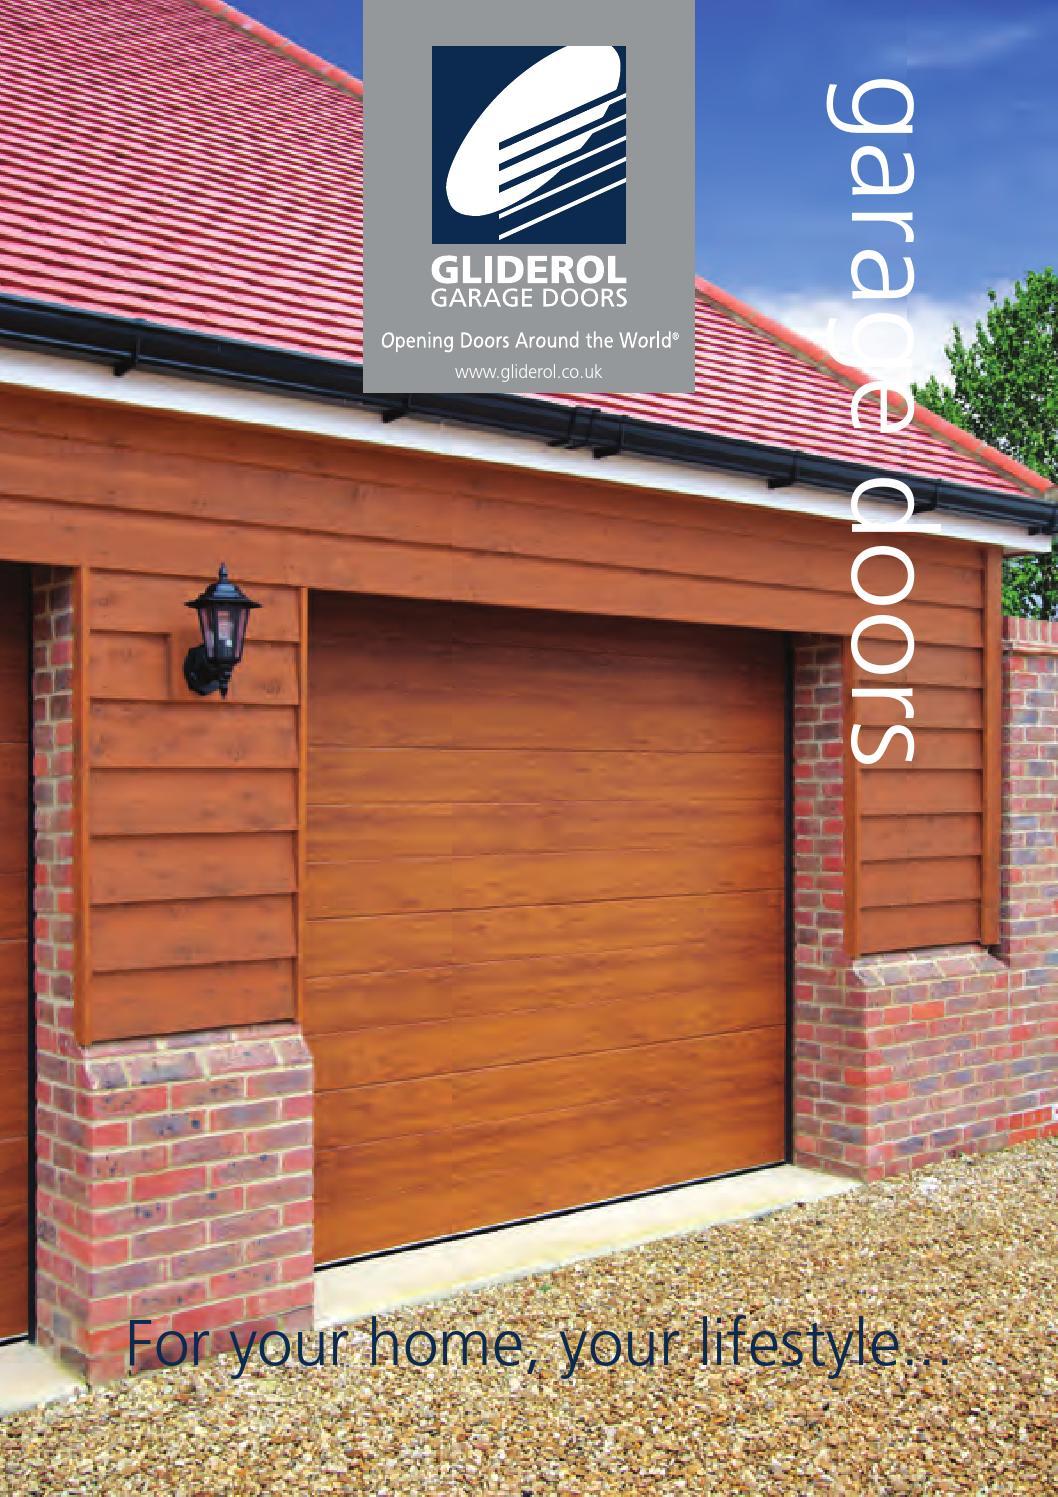 Gliderol Garage Doors >> Gliderol Range 2013 By James Waddington Issuu